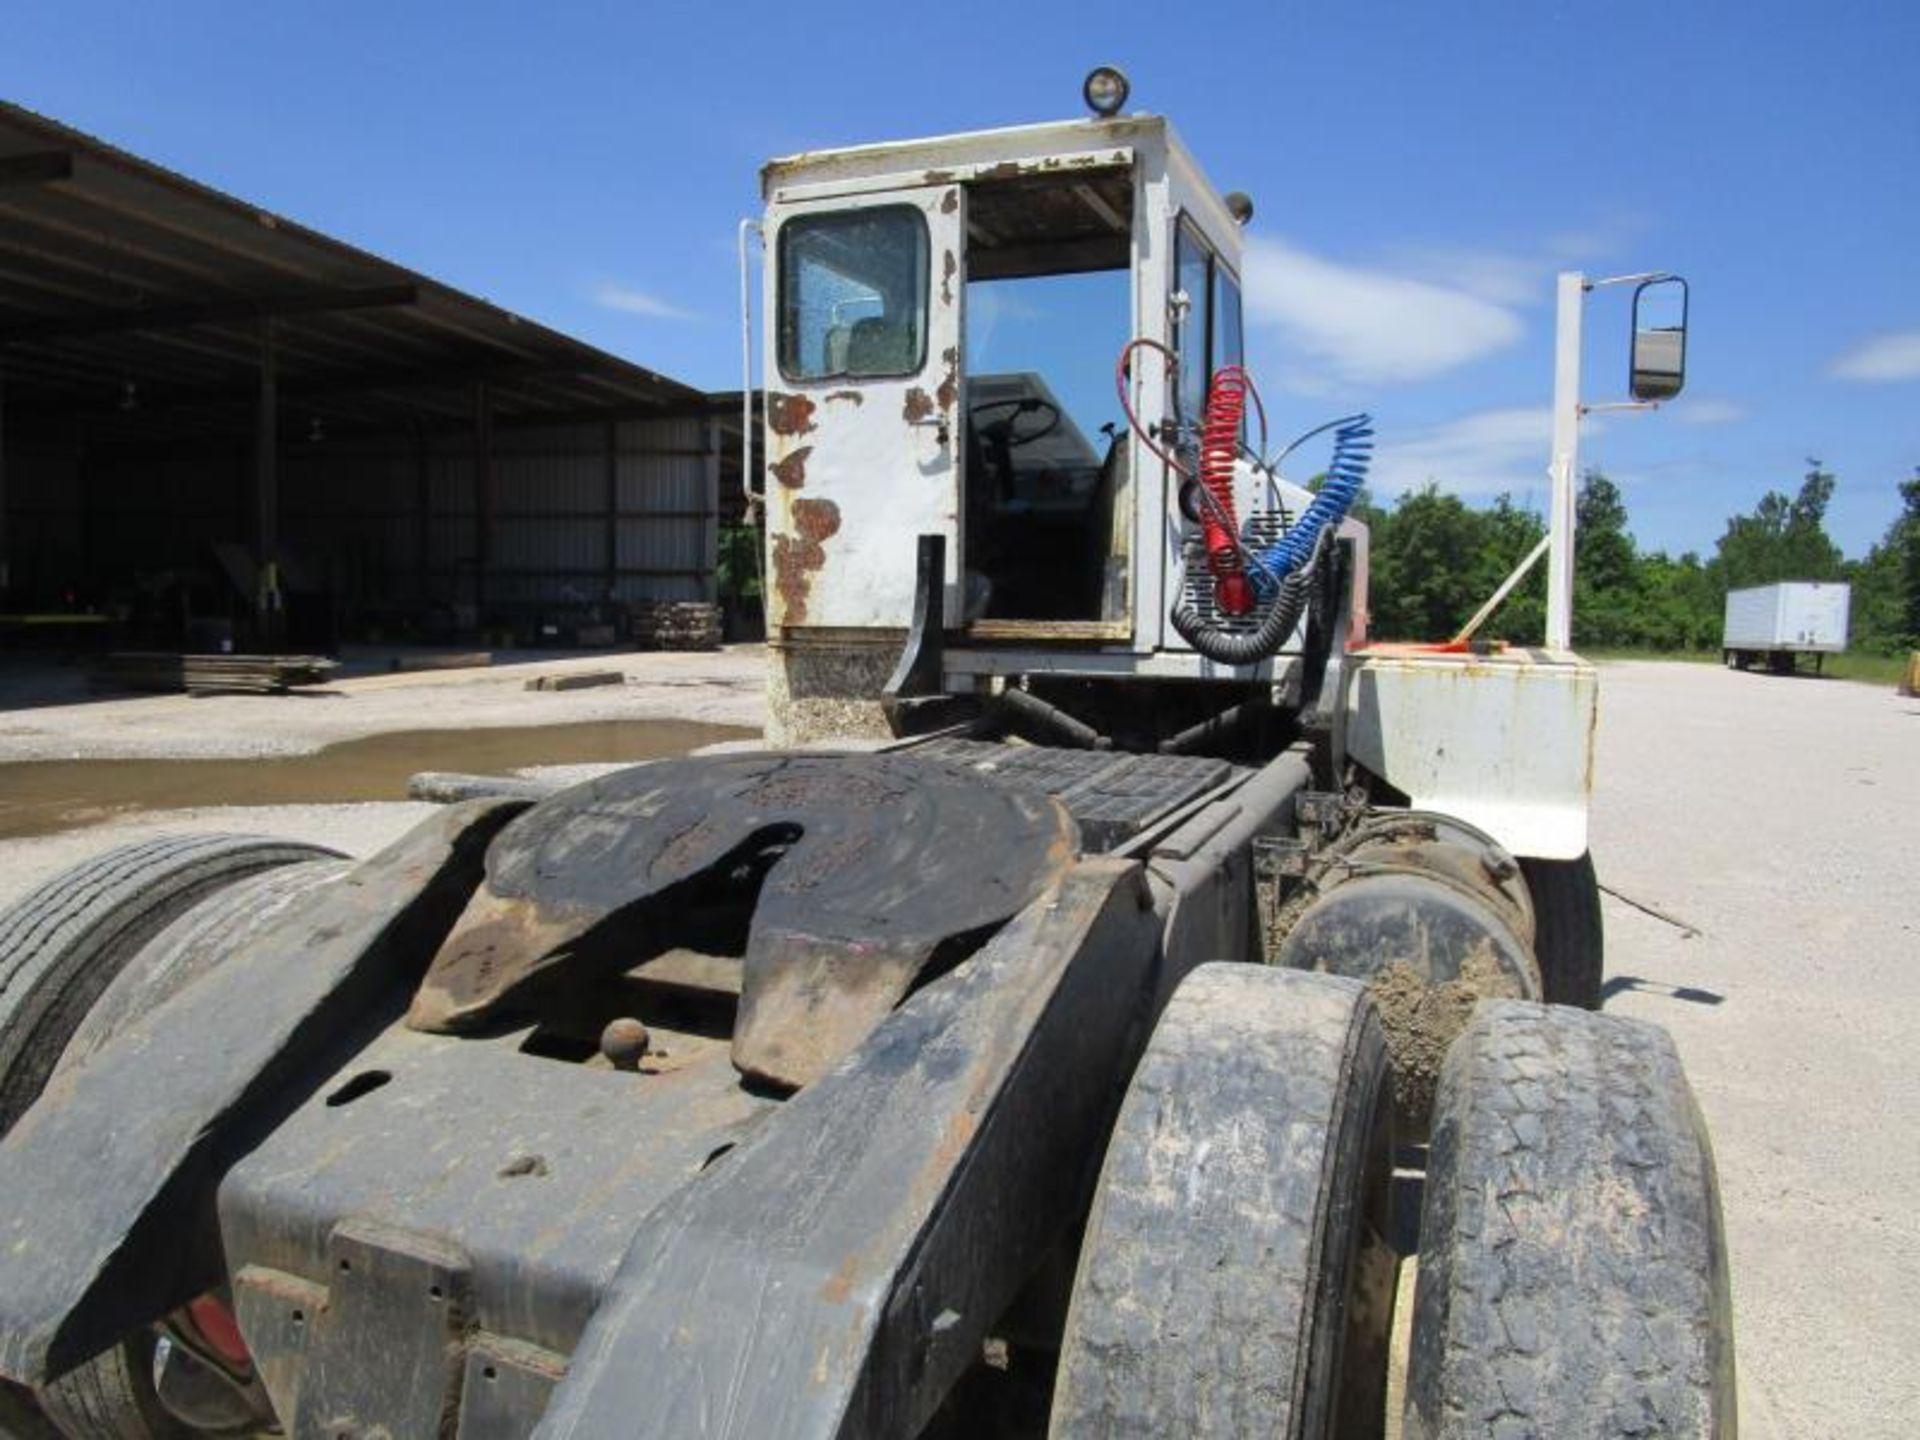 Yard truck by Ottawa truck model# 30 SN: 65044390 engine hours 8,164 - Image 5 of 8